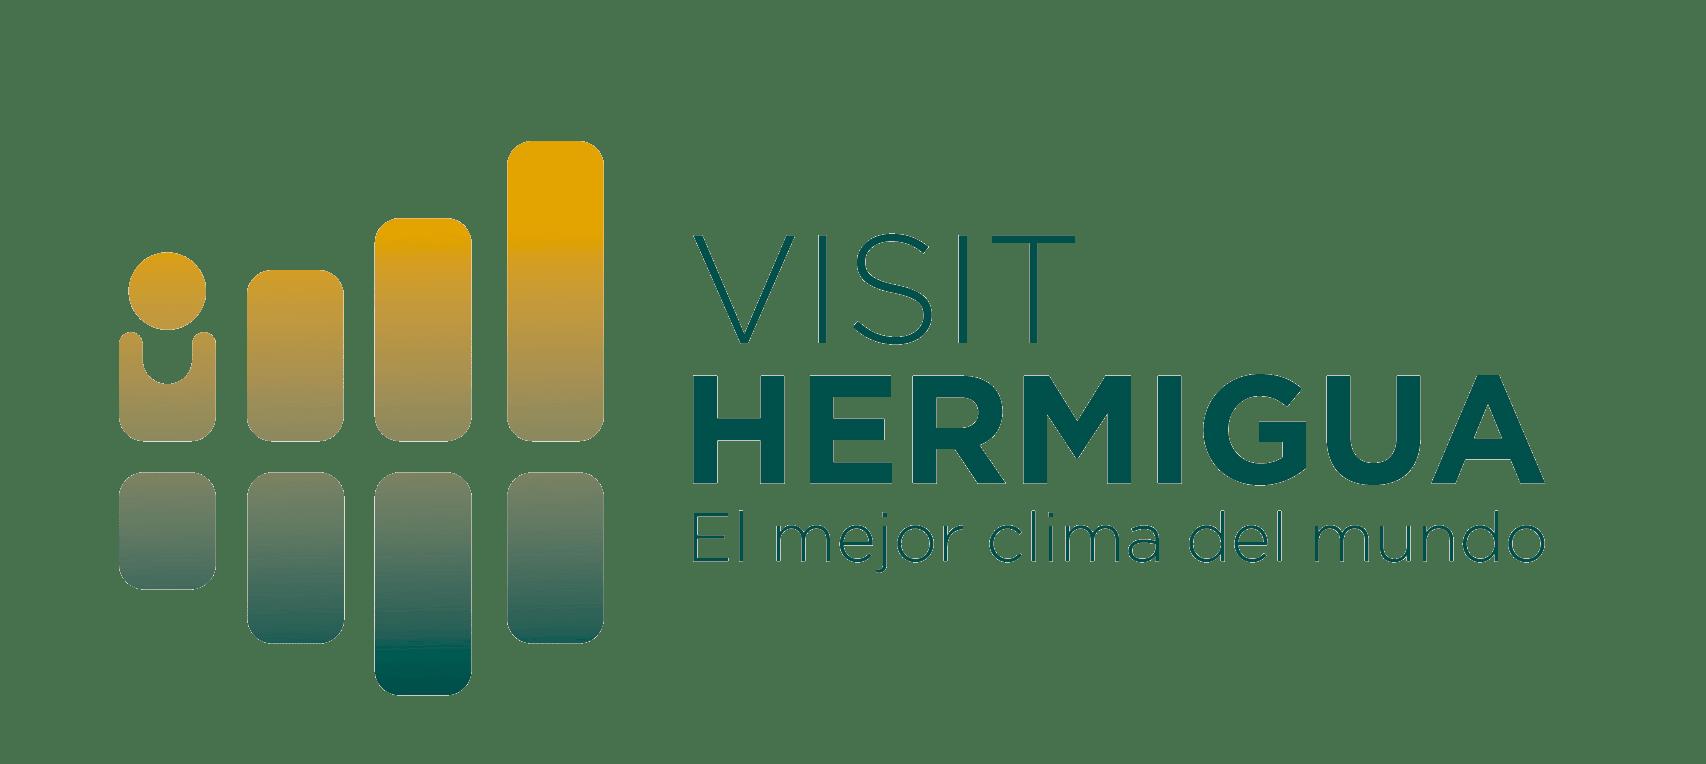 Visit Hermigua